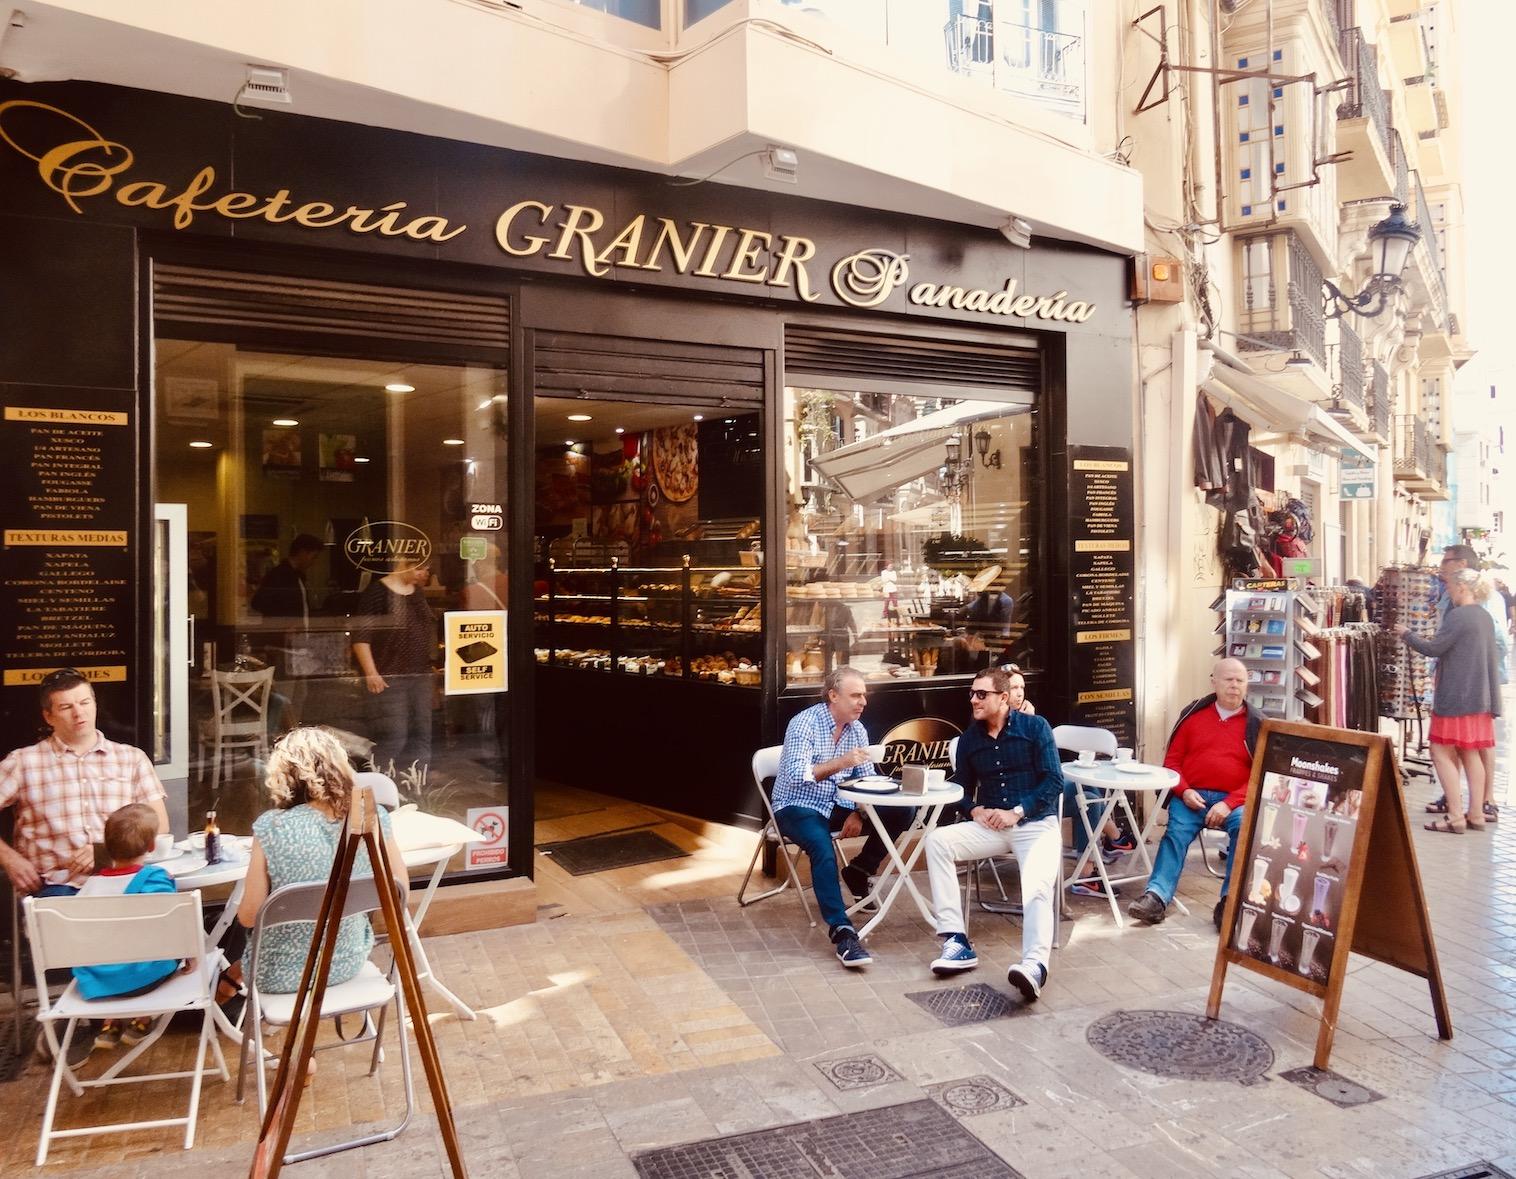 Cafeteria Granier Panaderia Malaga.